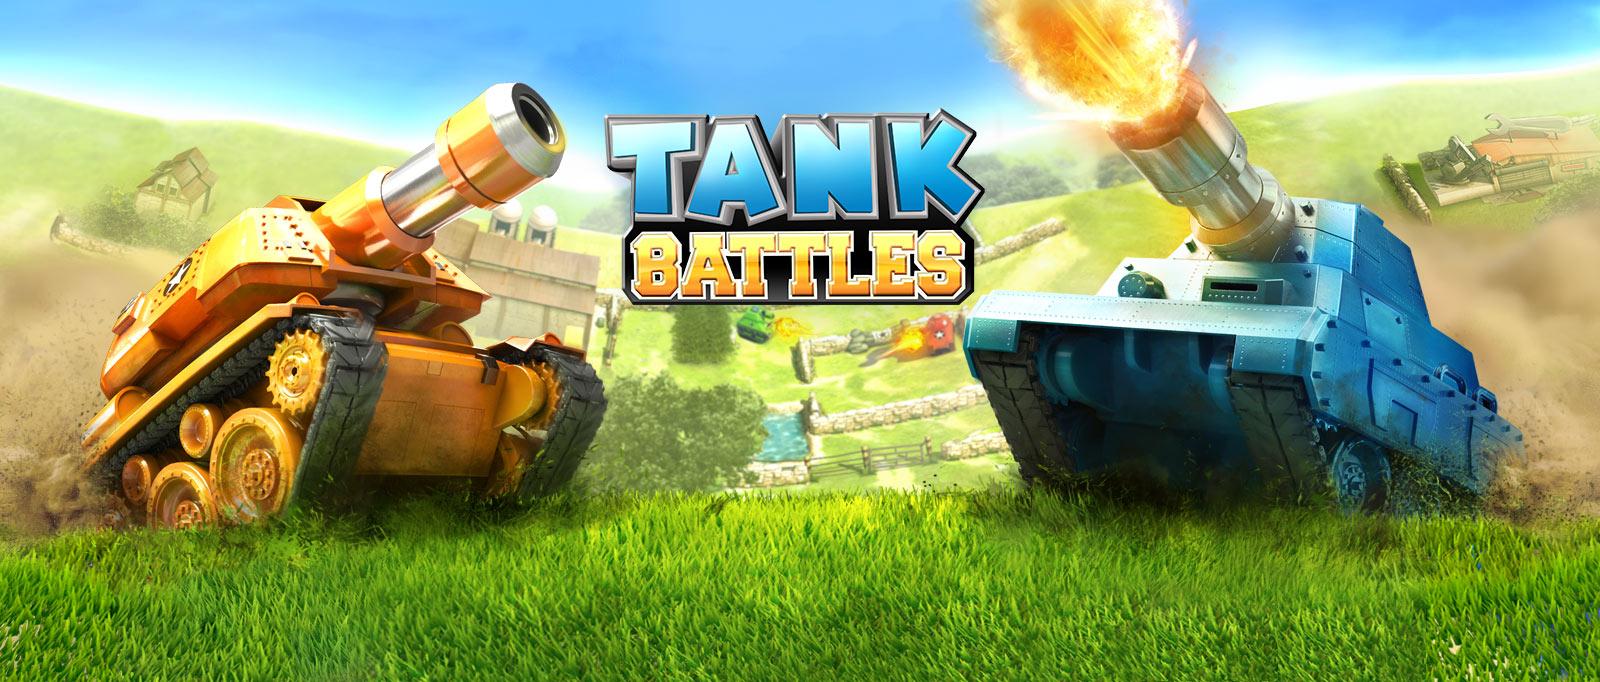 Tank Battles Patlayan Eğlence!